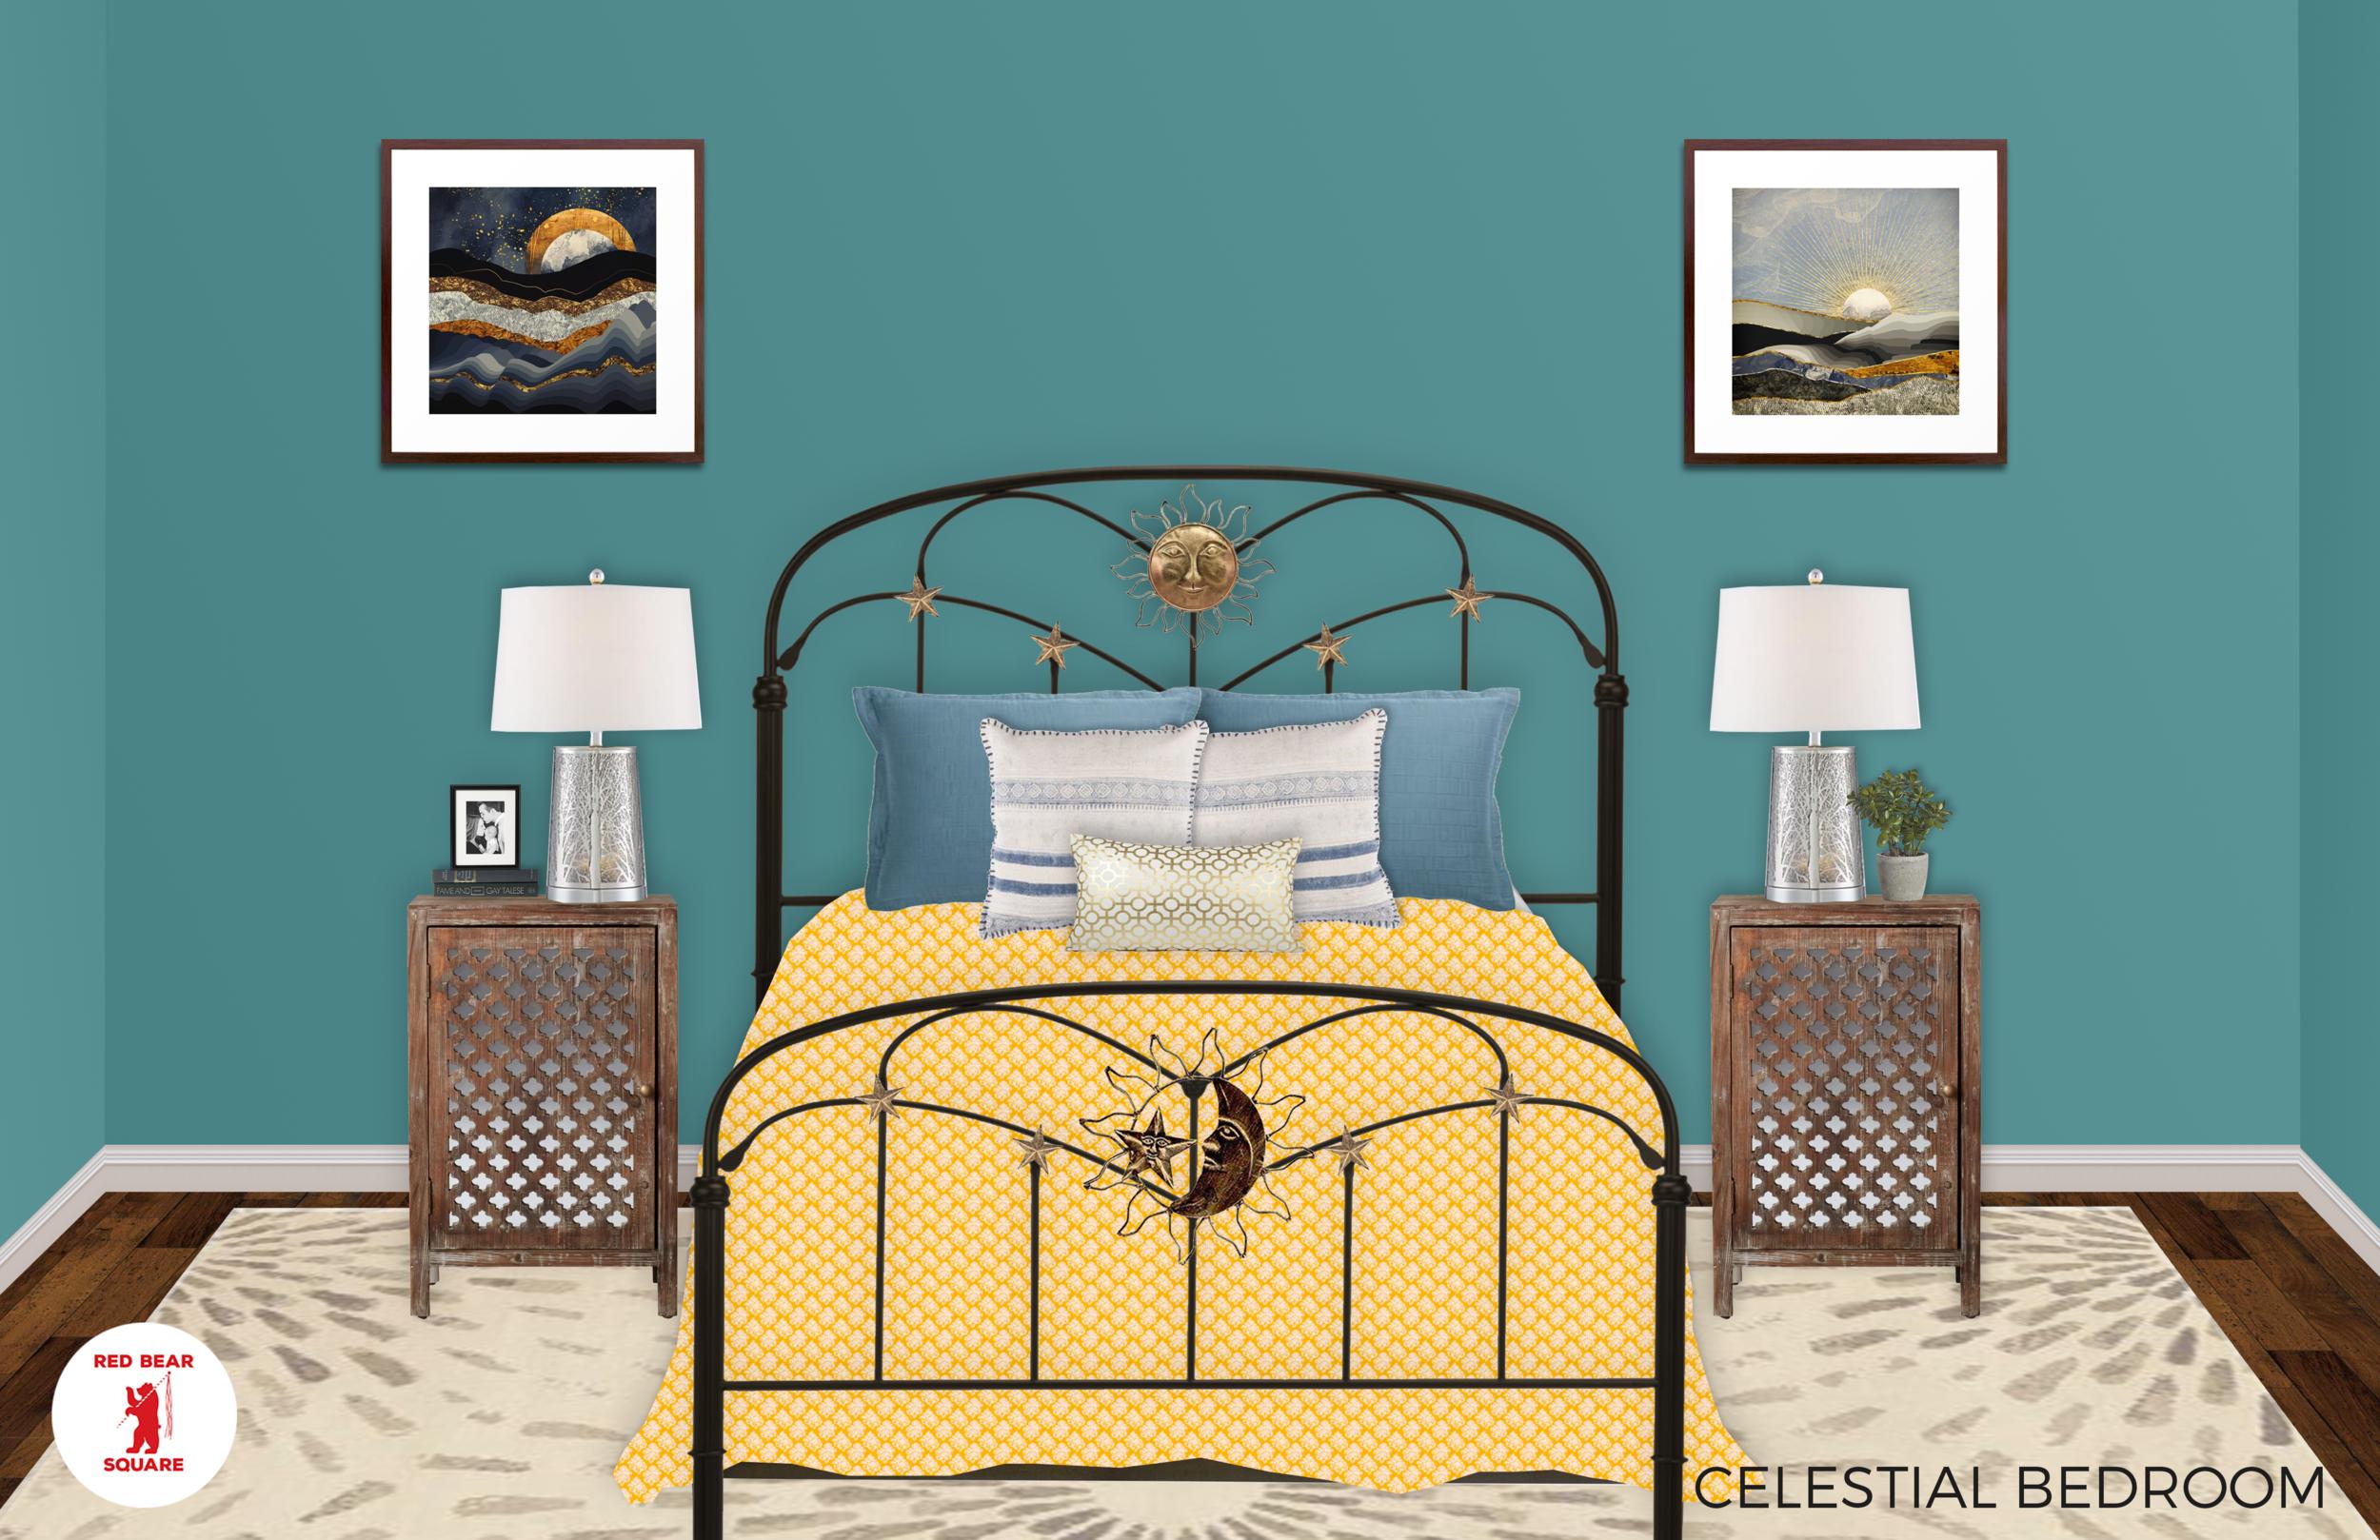 Boho Celestial Bedroom Rendering